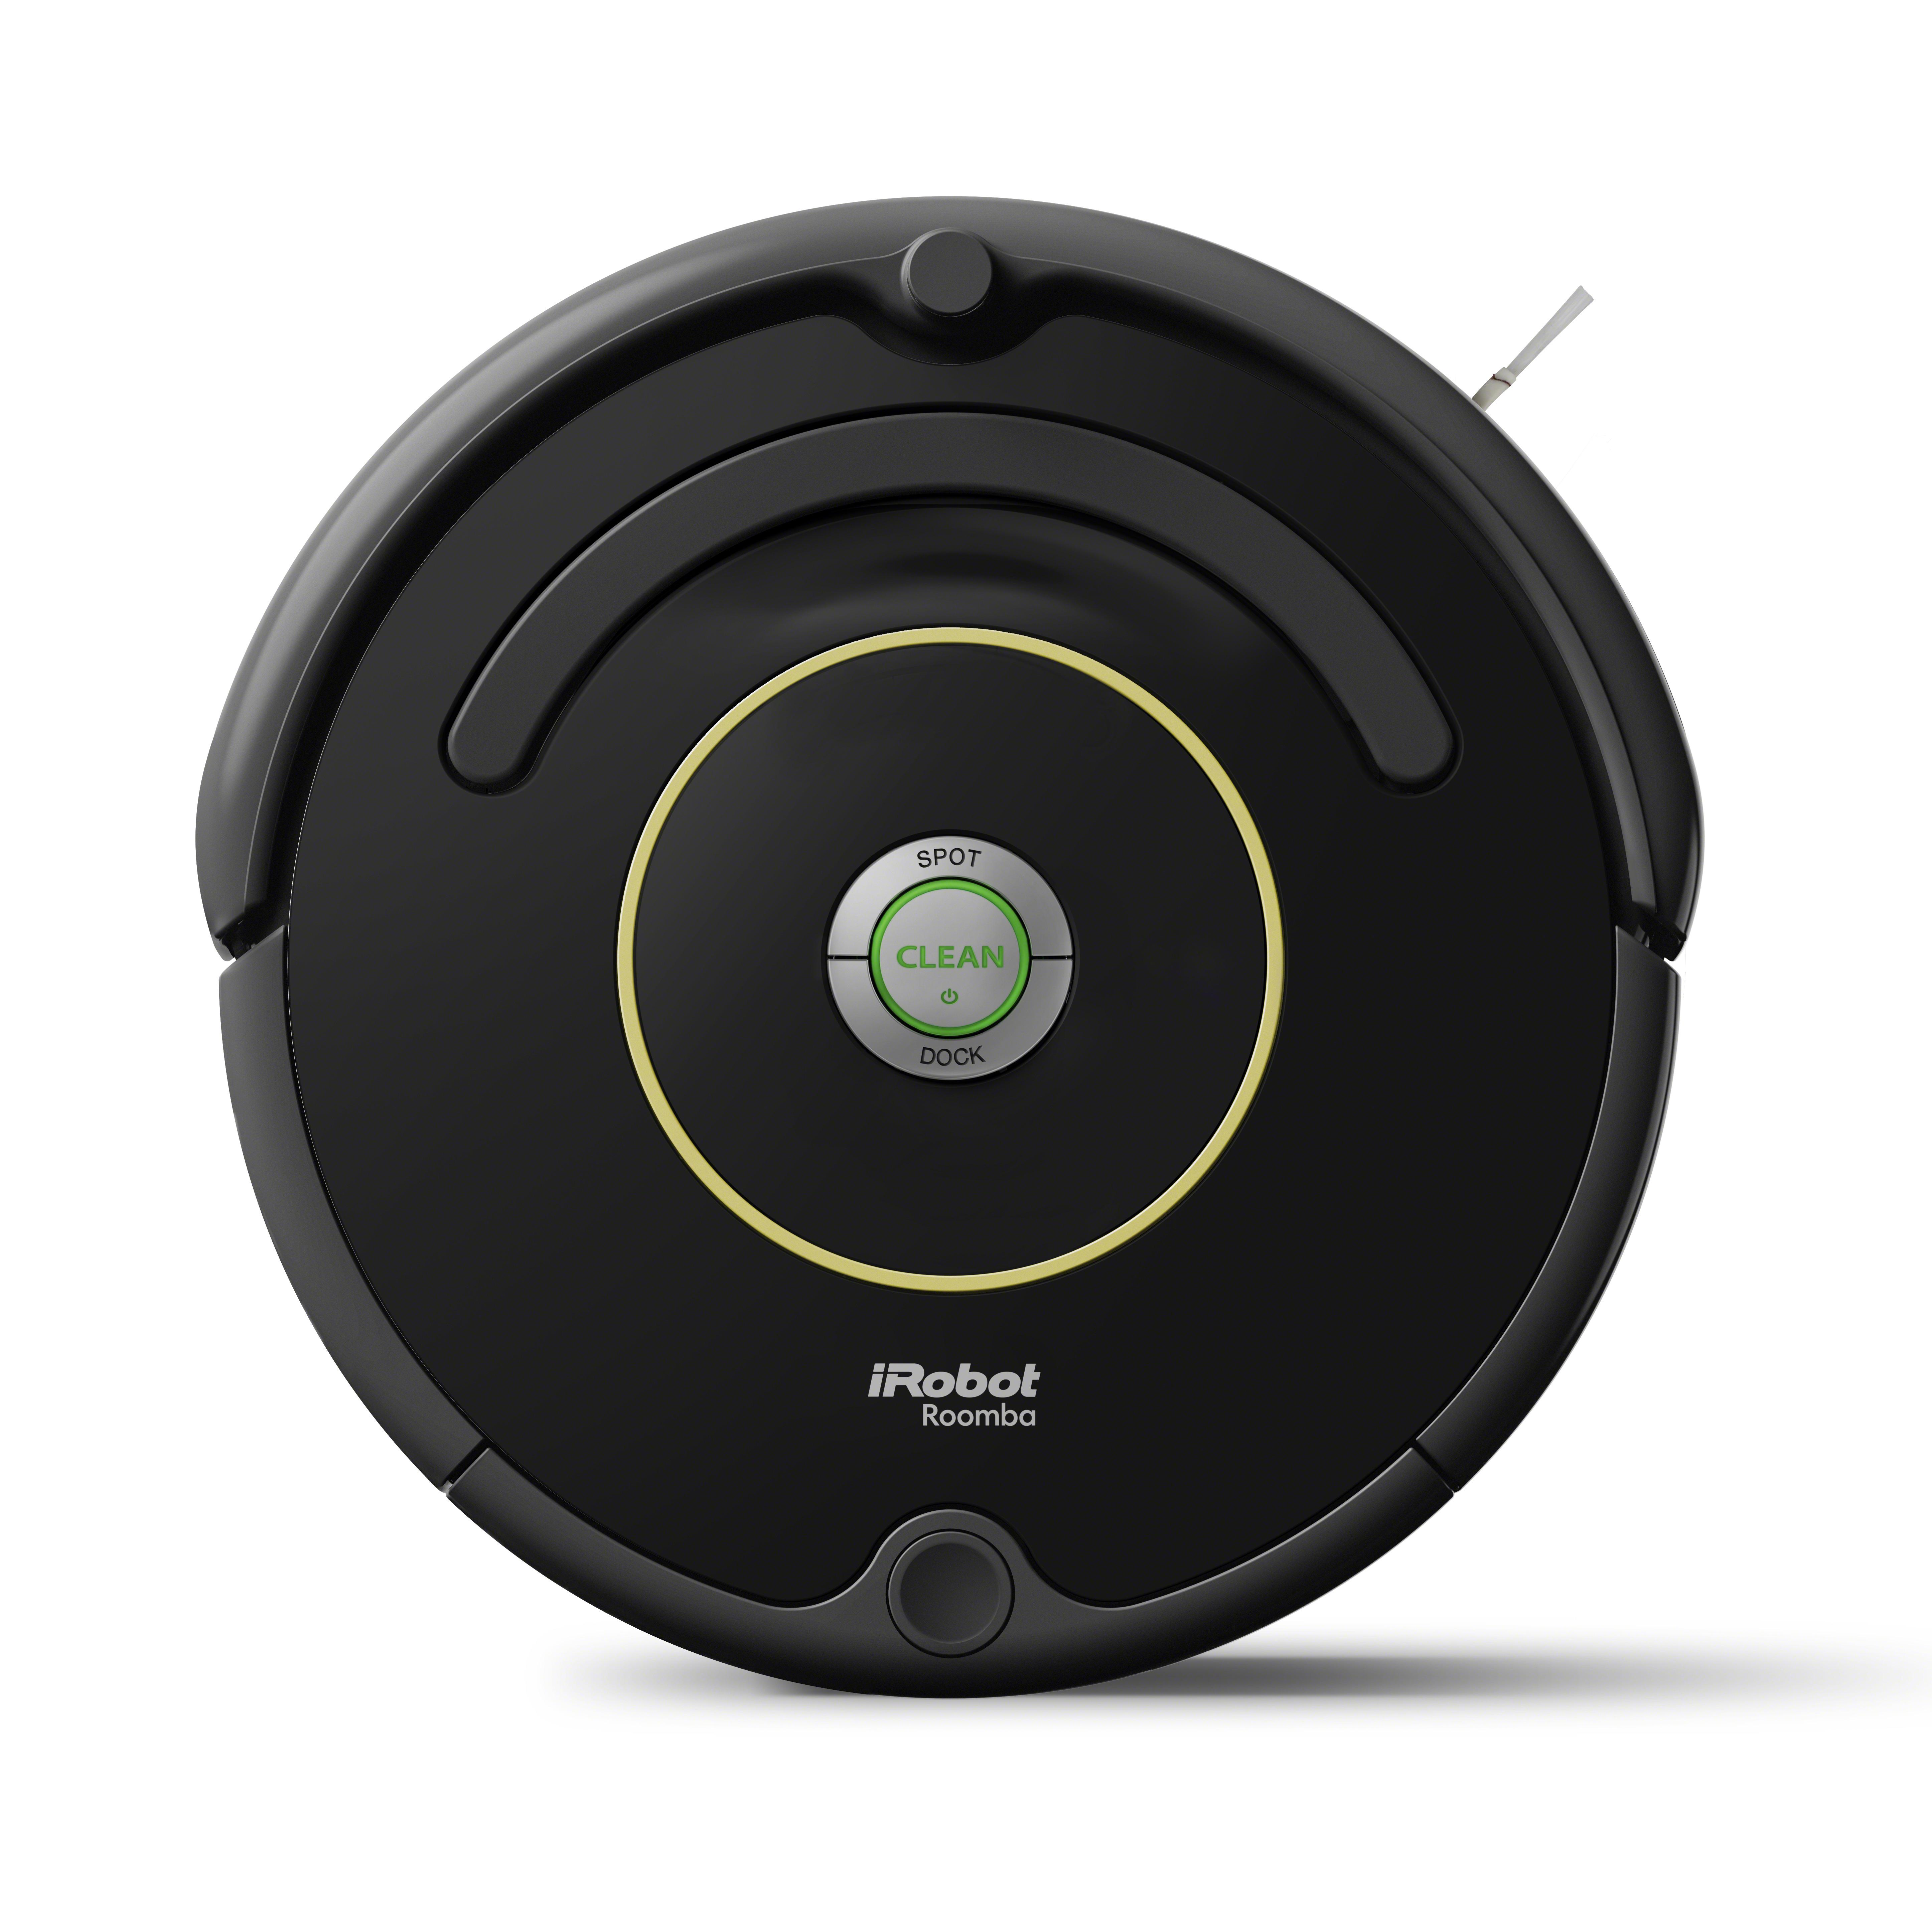 iRobot robotstøvsuger - Roomba 612